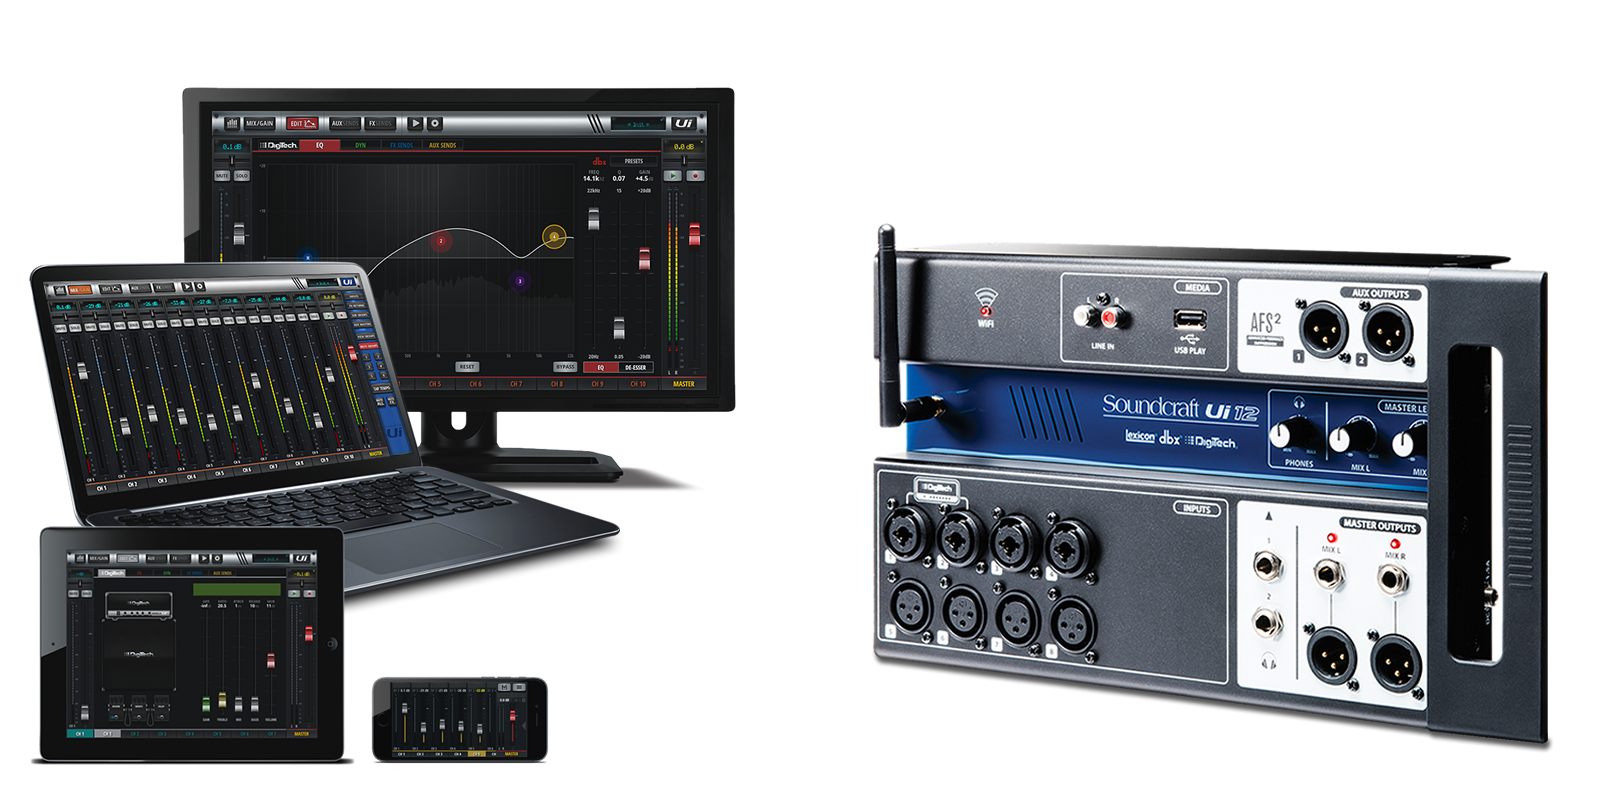 Ui12 | Soundcraft - Professional Audio Mixers